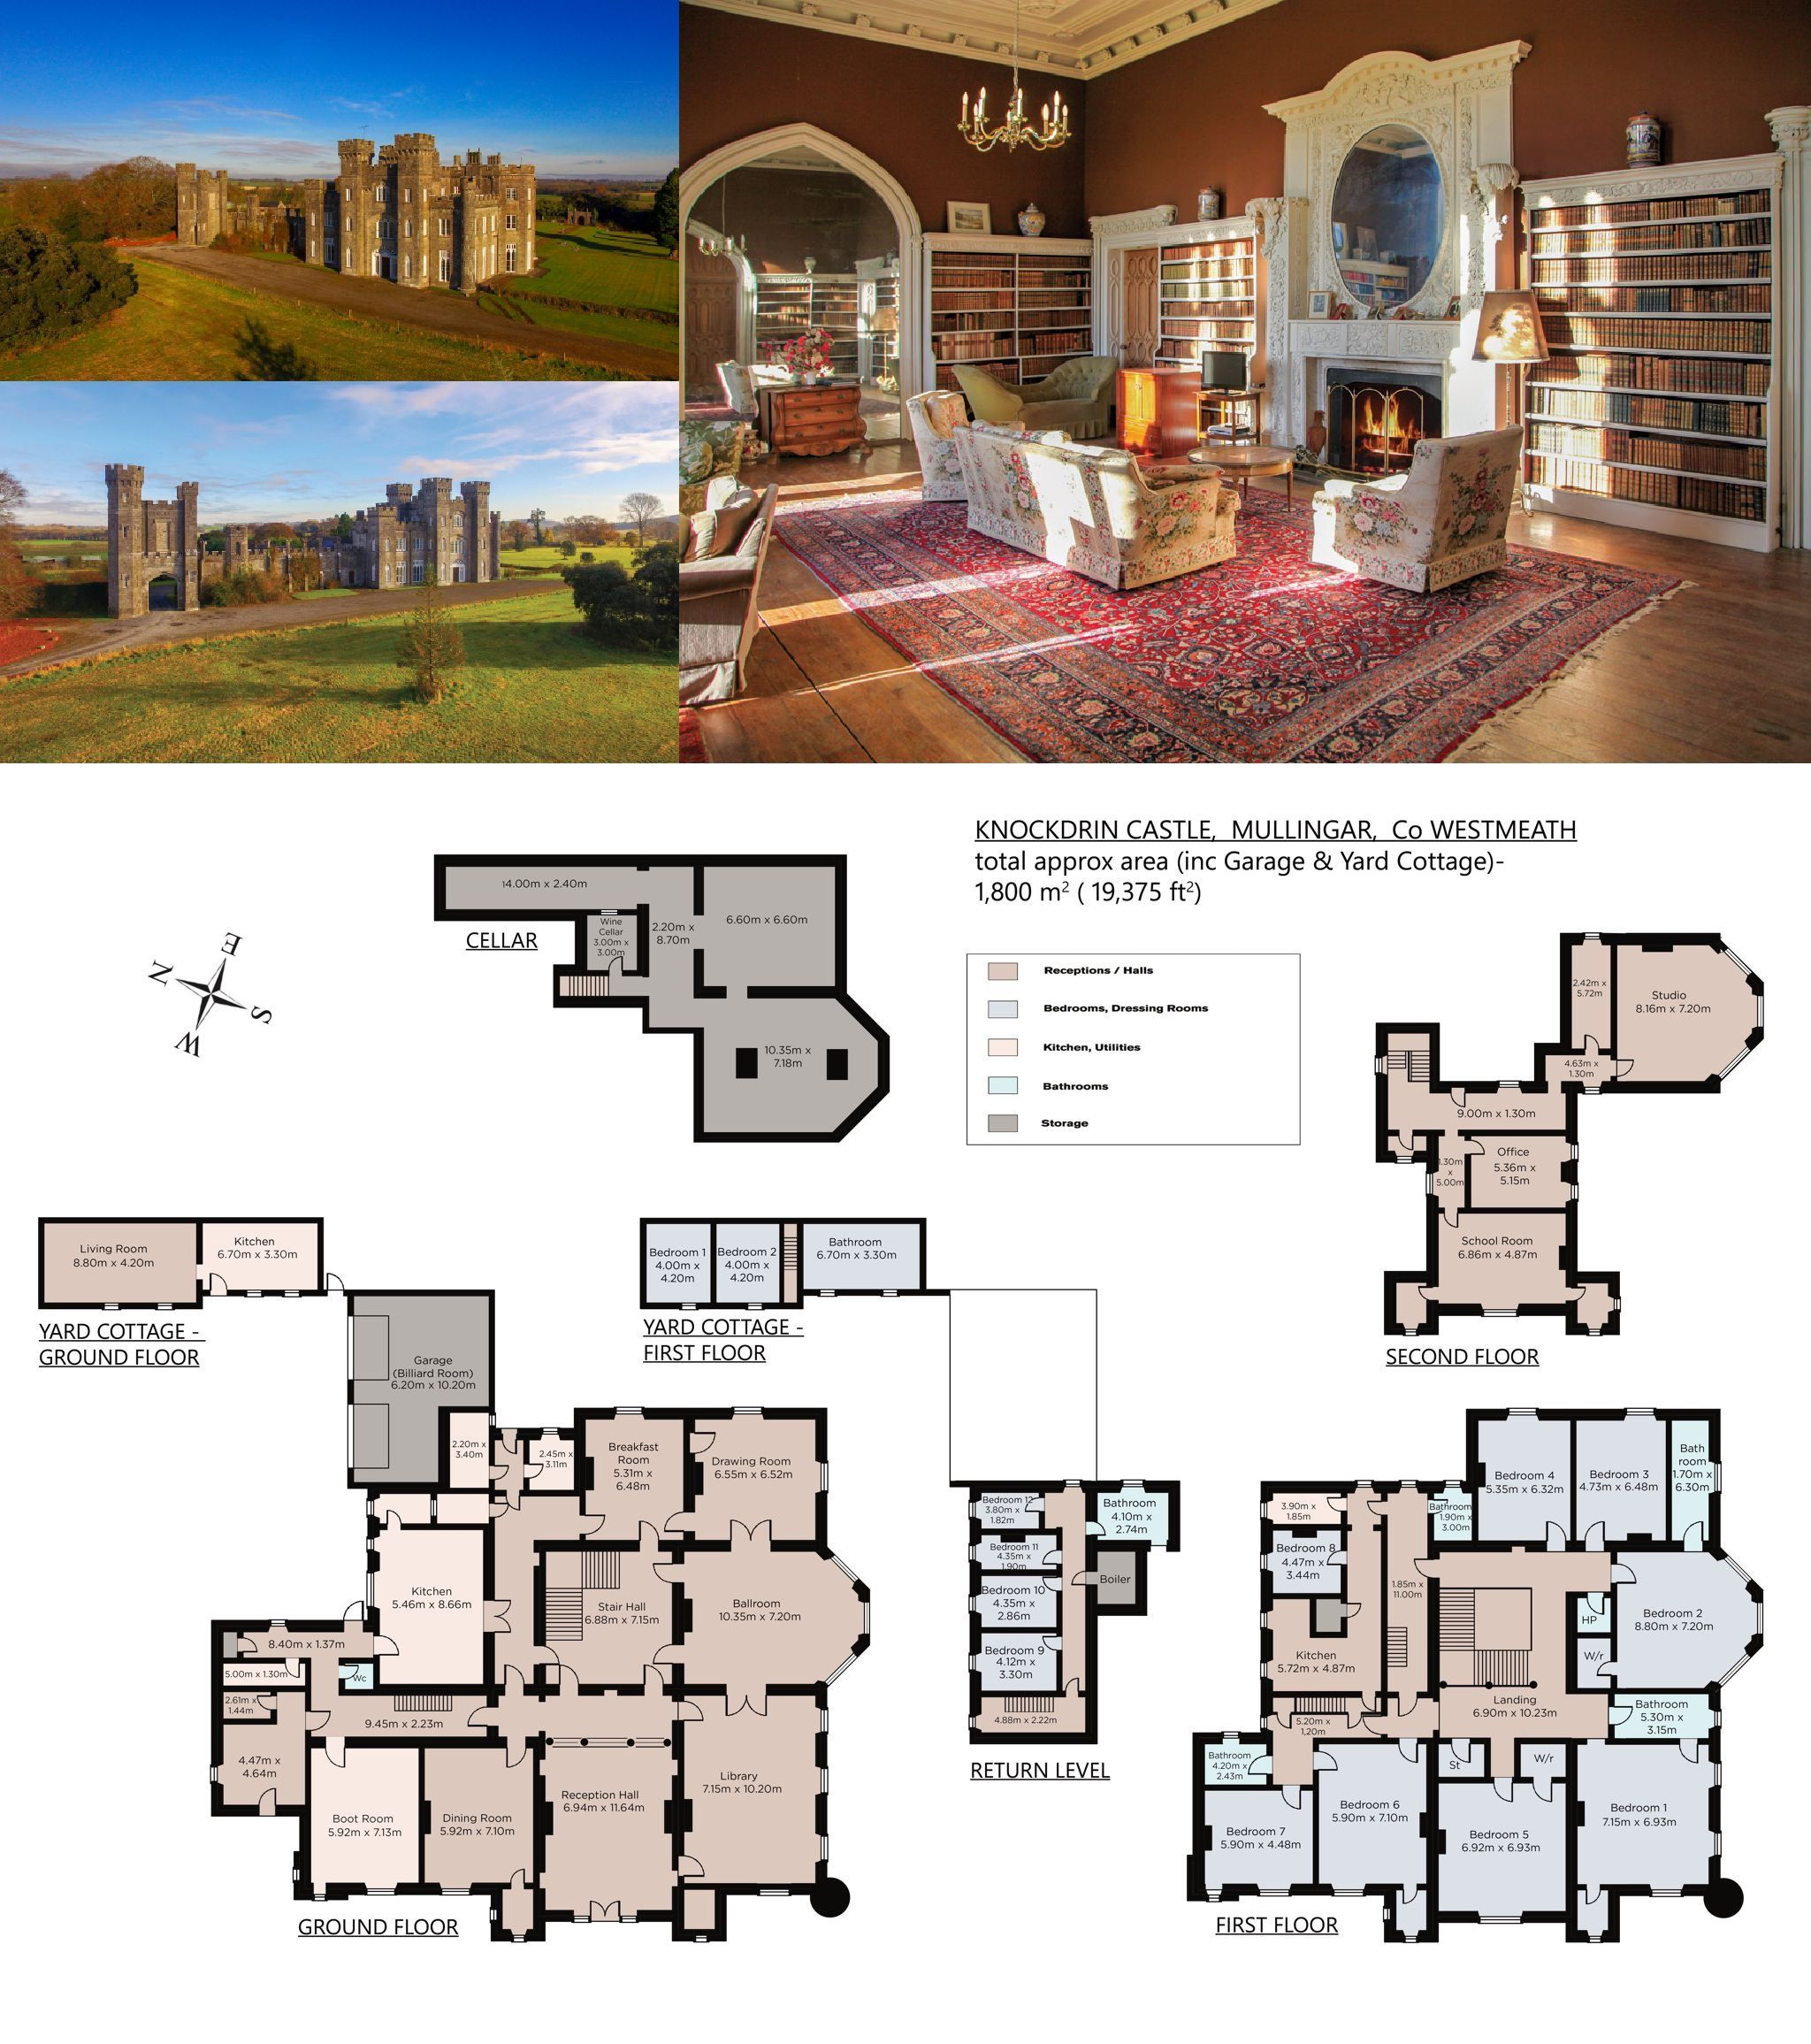 Knockdrin Castle Mullingar County Westmeath Ireland Leading Estates Of The World In 2021 Castle Gothic House Castle House